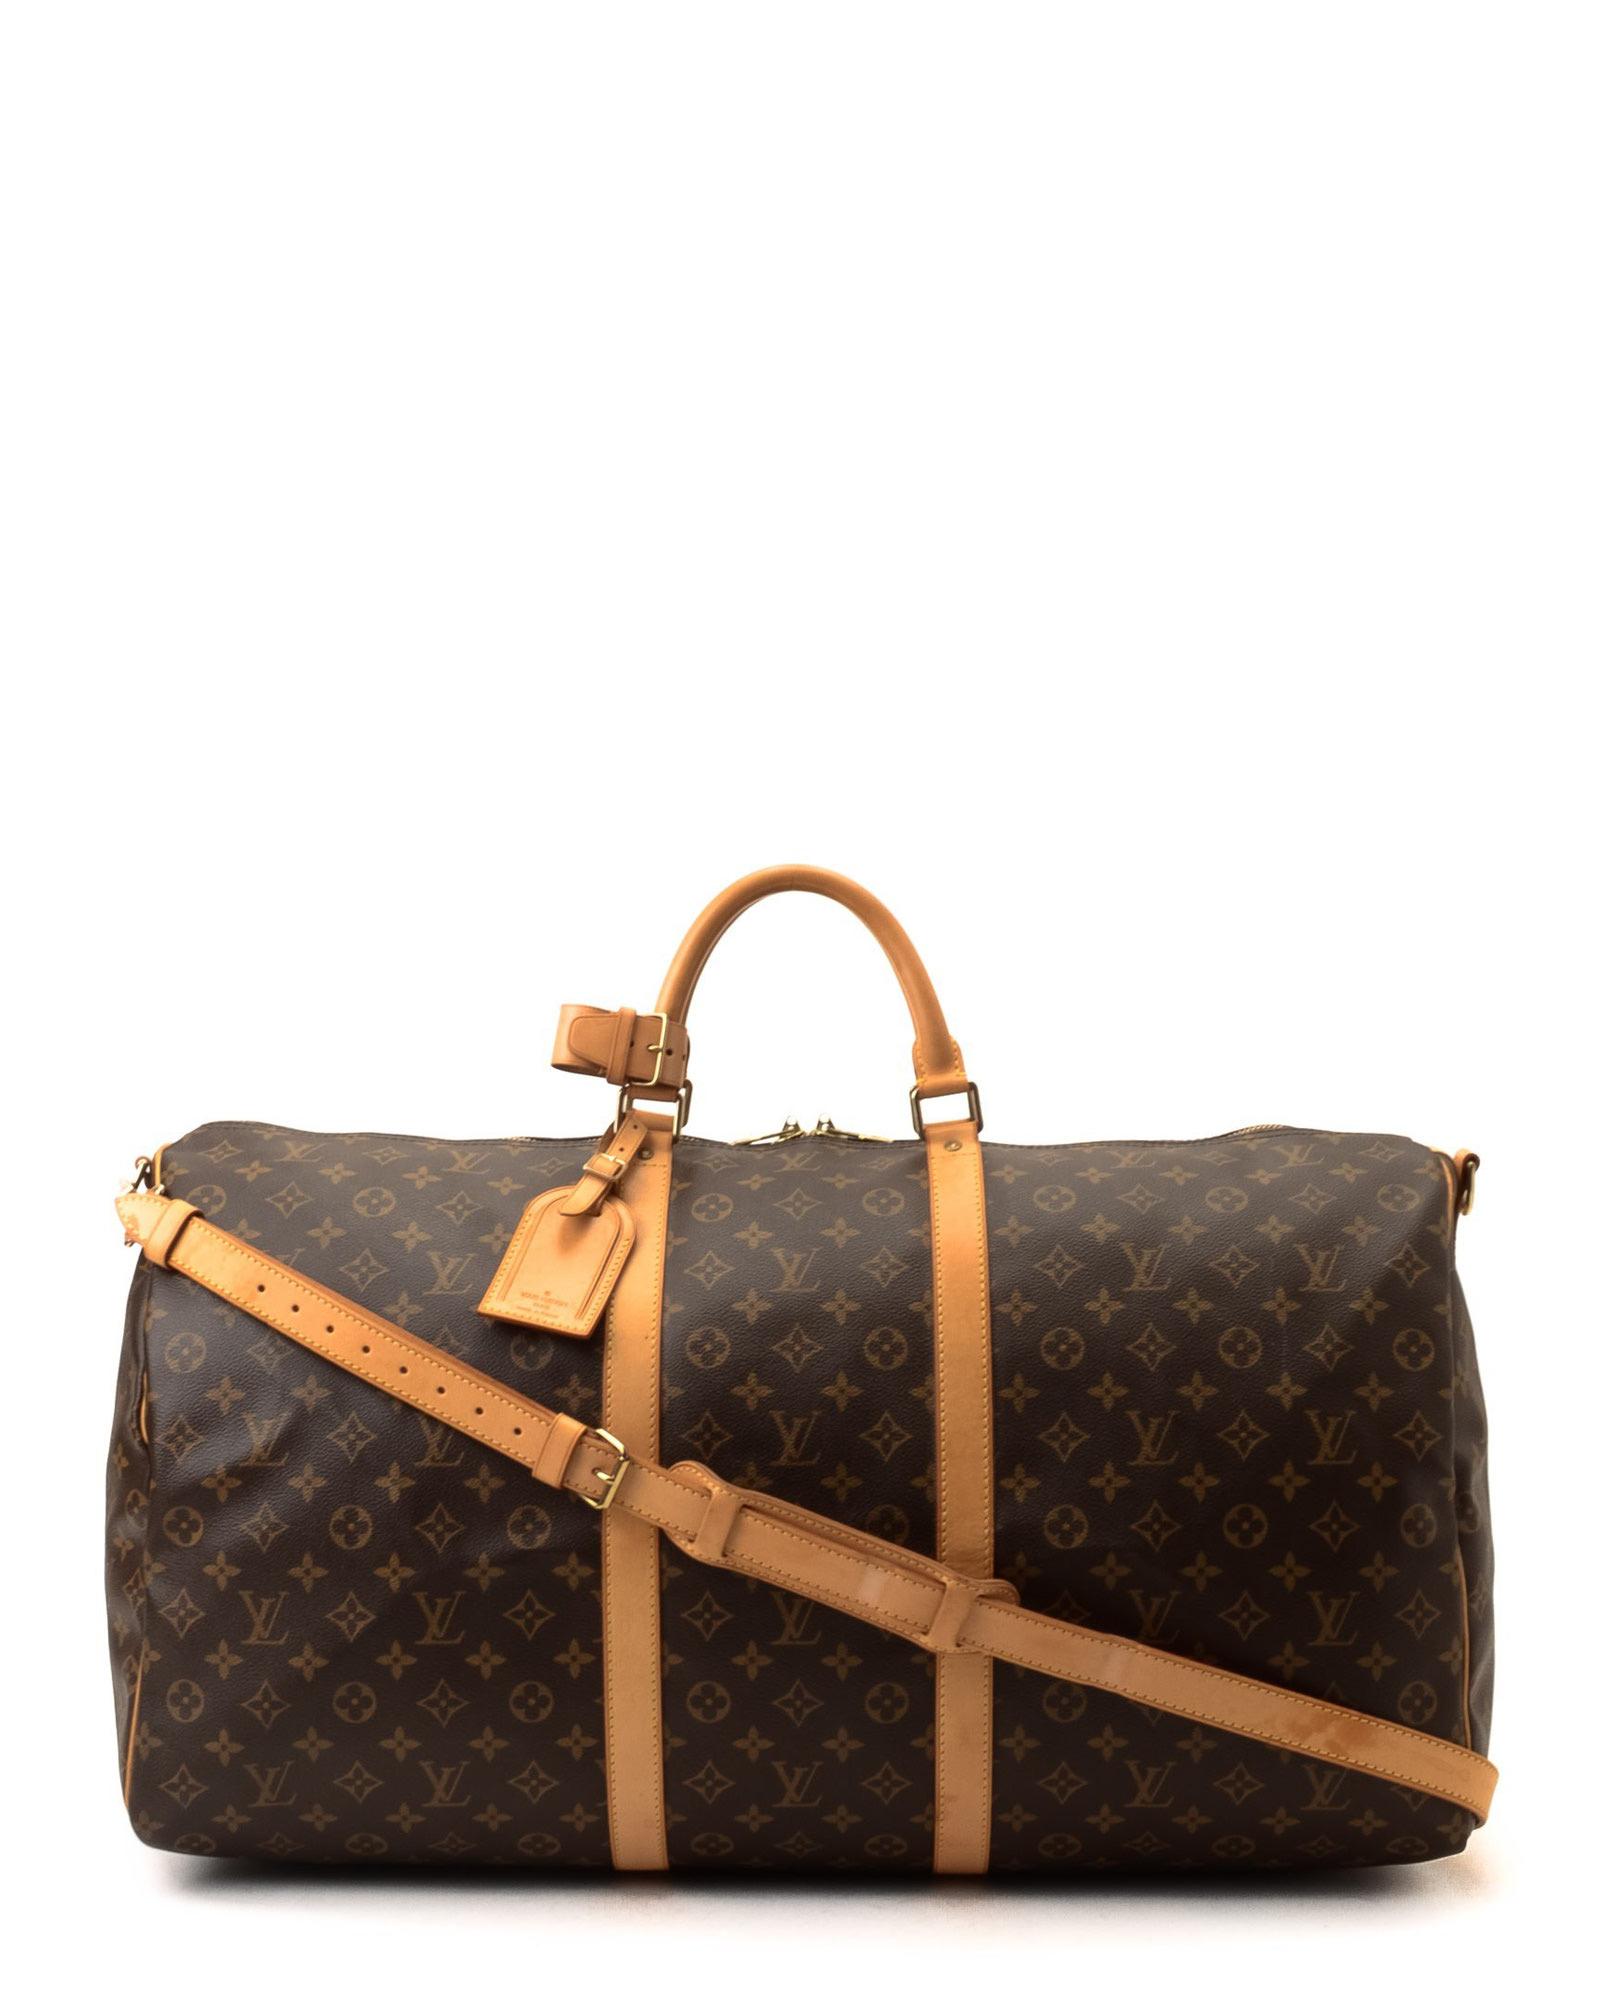 370c62894039 Travel Bags By Louis Vuitton - Style Guru  Fashion